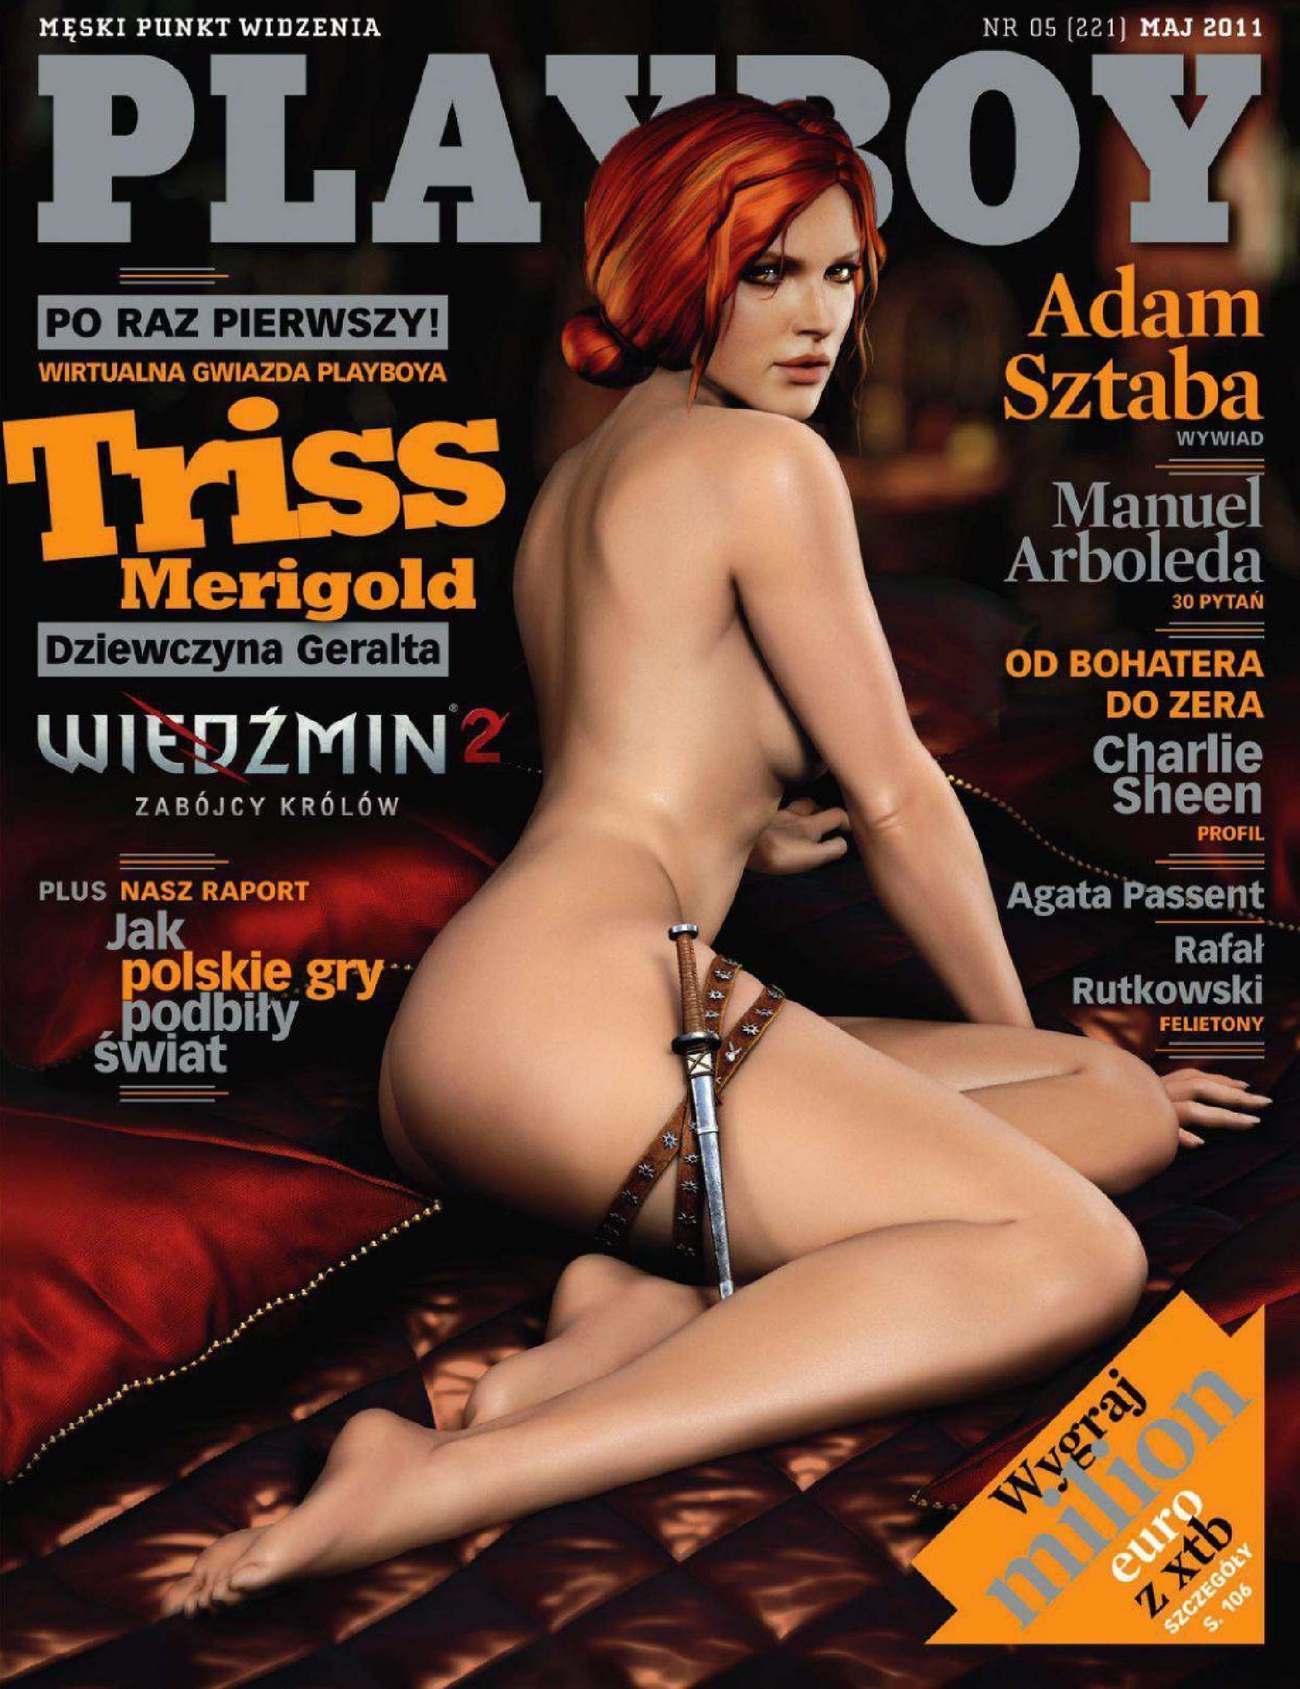 715605456_Poland_2011_051_123_509lo.jpg